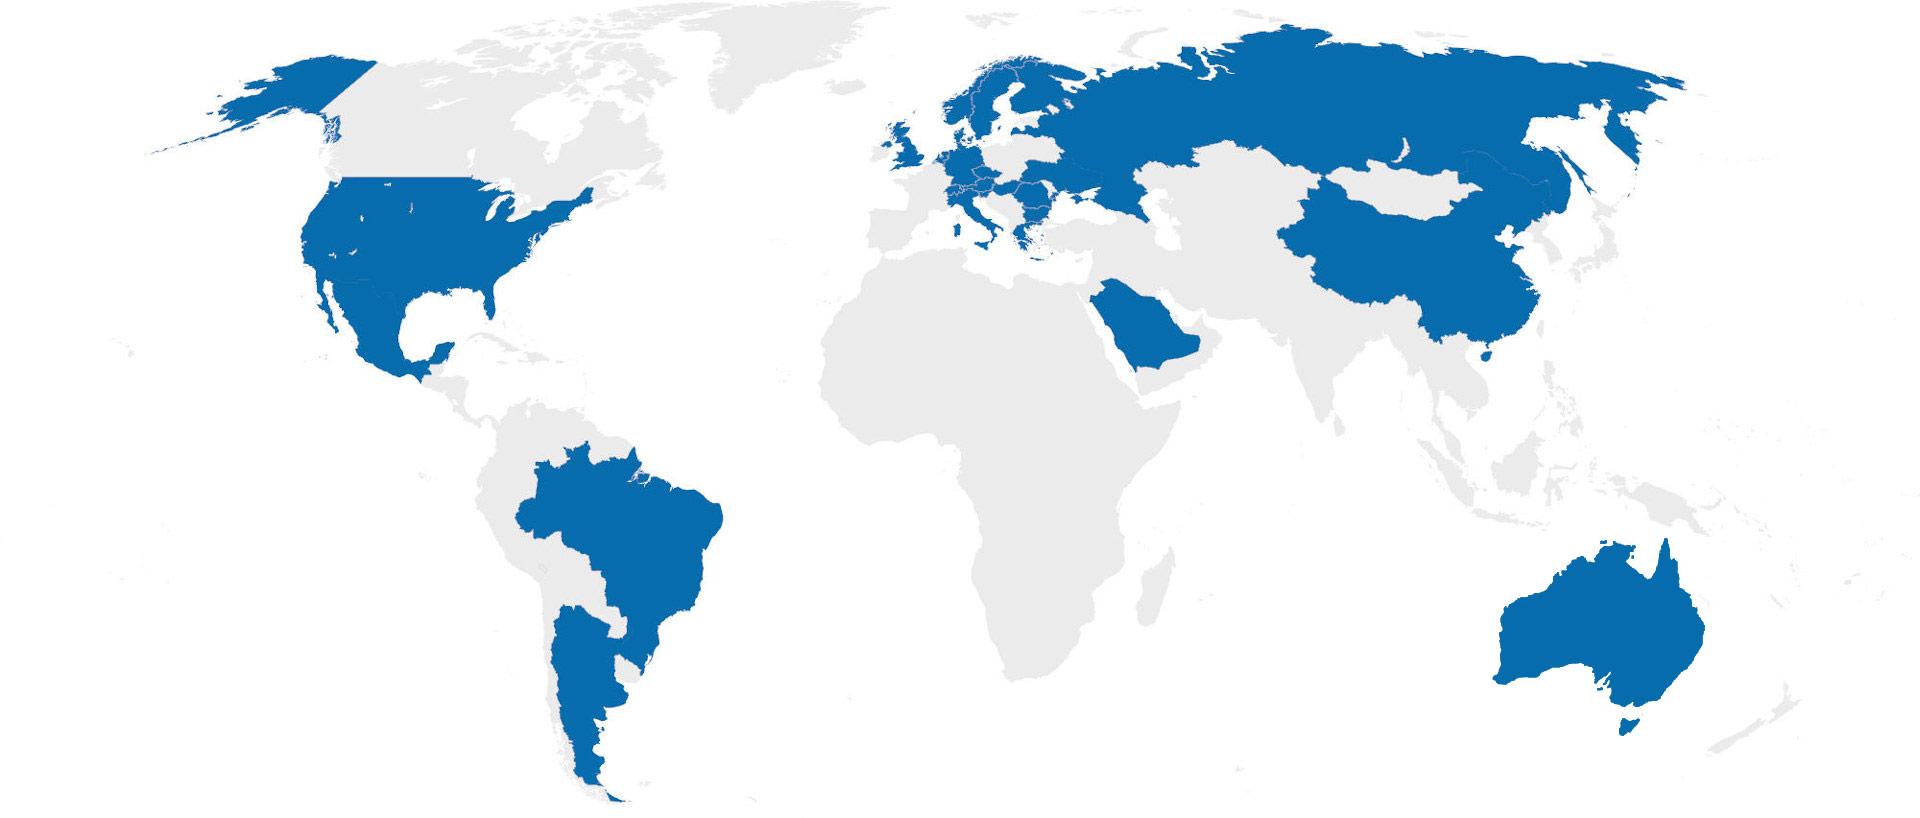 SWARCO Locations Worldwide